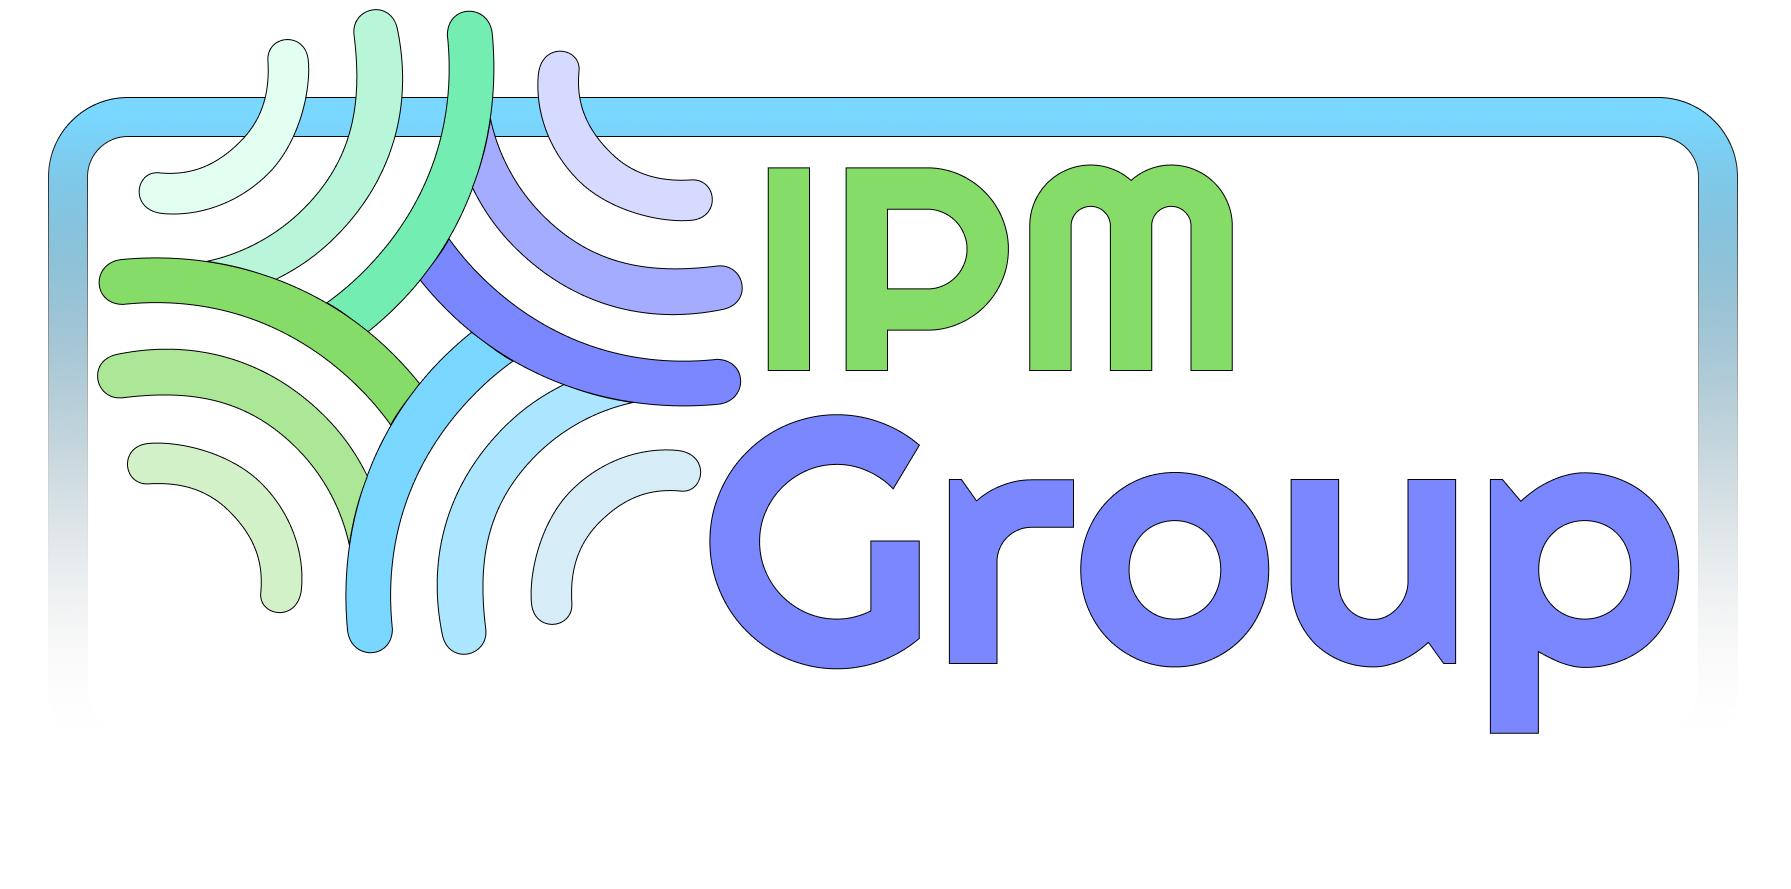 Разработка логотипа для управляющей компании фото f_2625f8494d70ea2b.jpg